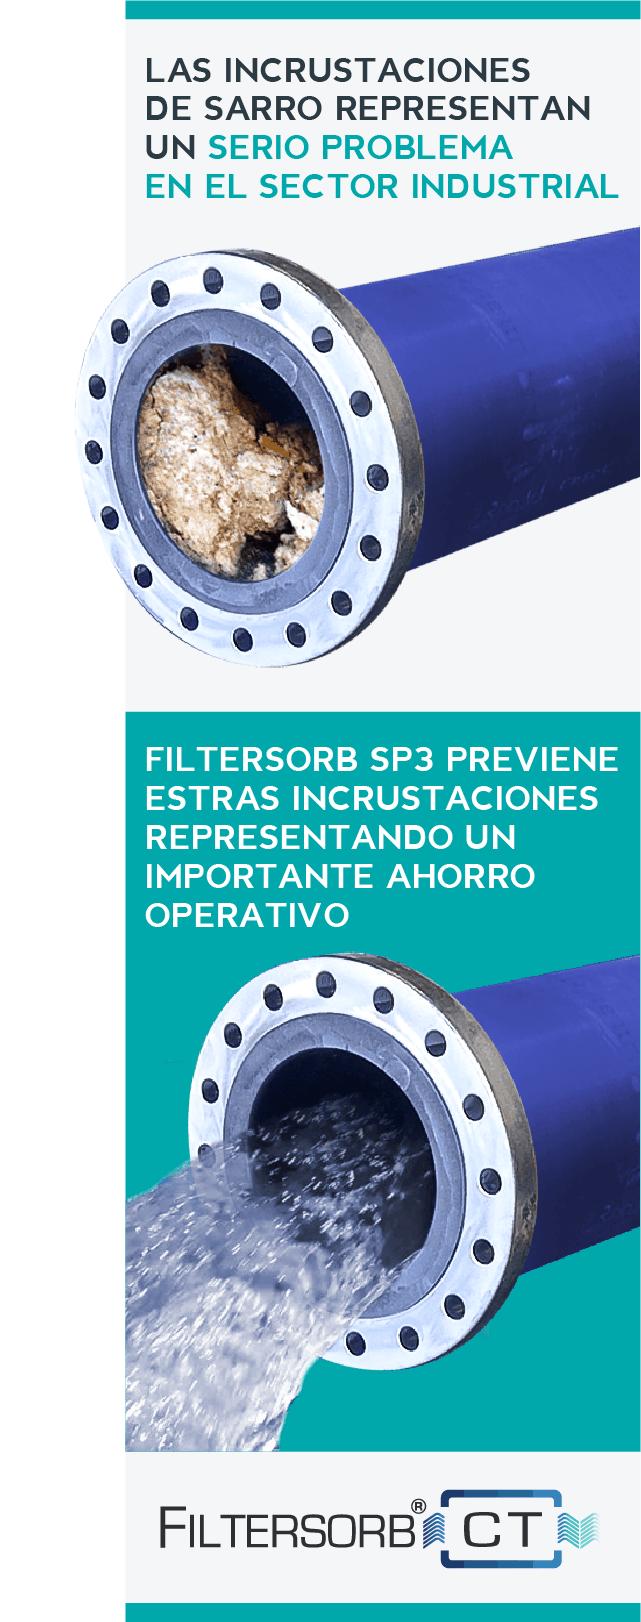 Filtersorb – Filtersorb CT